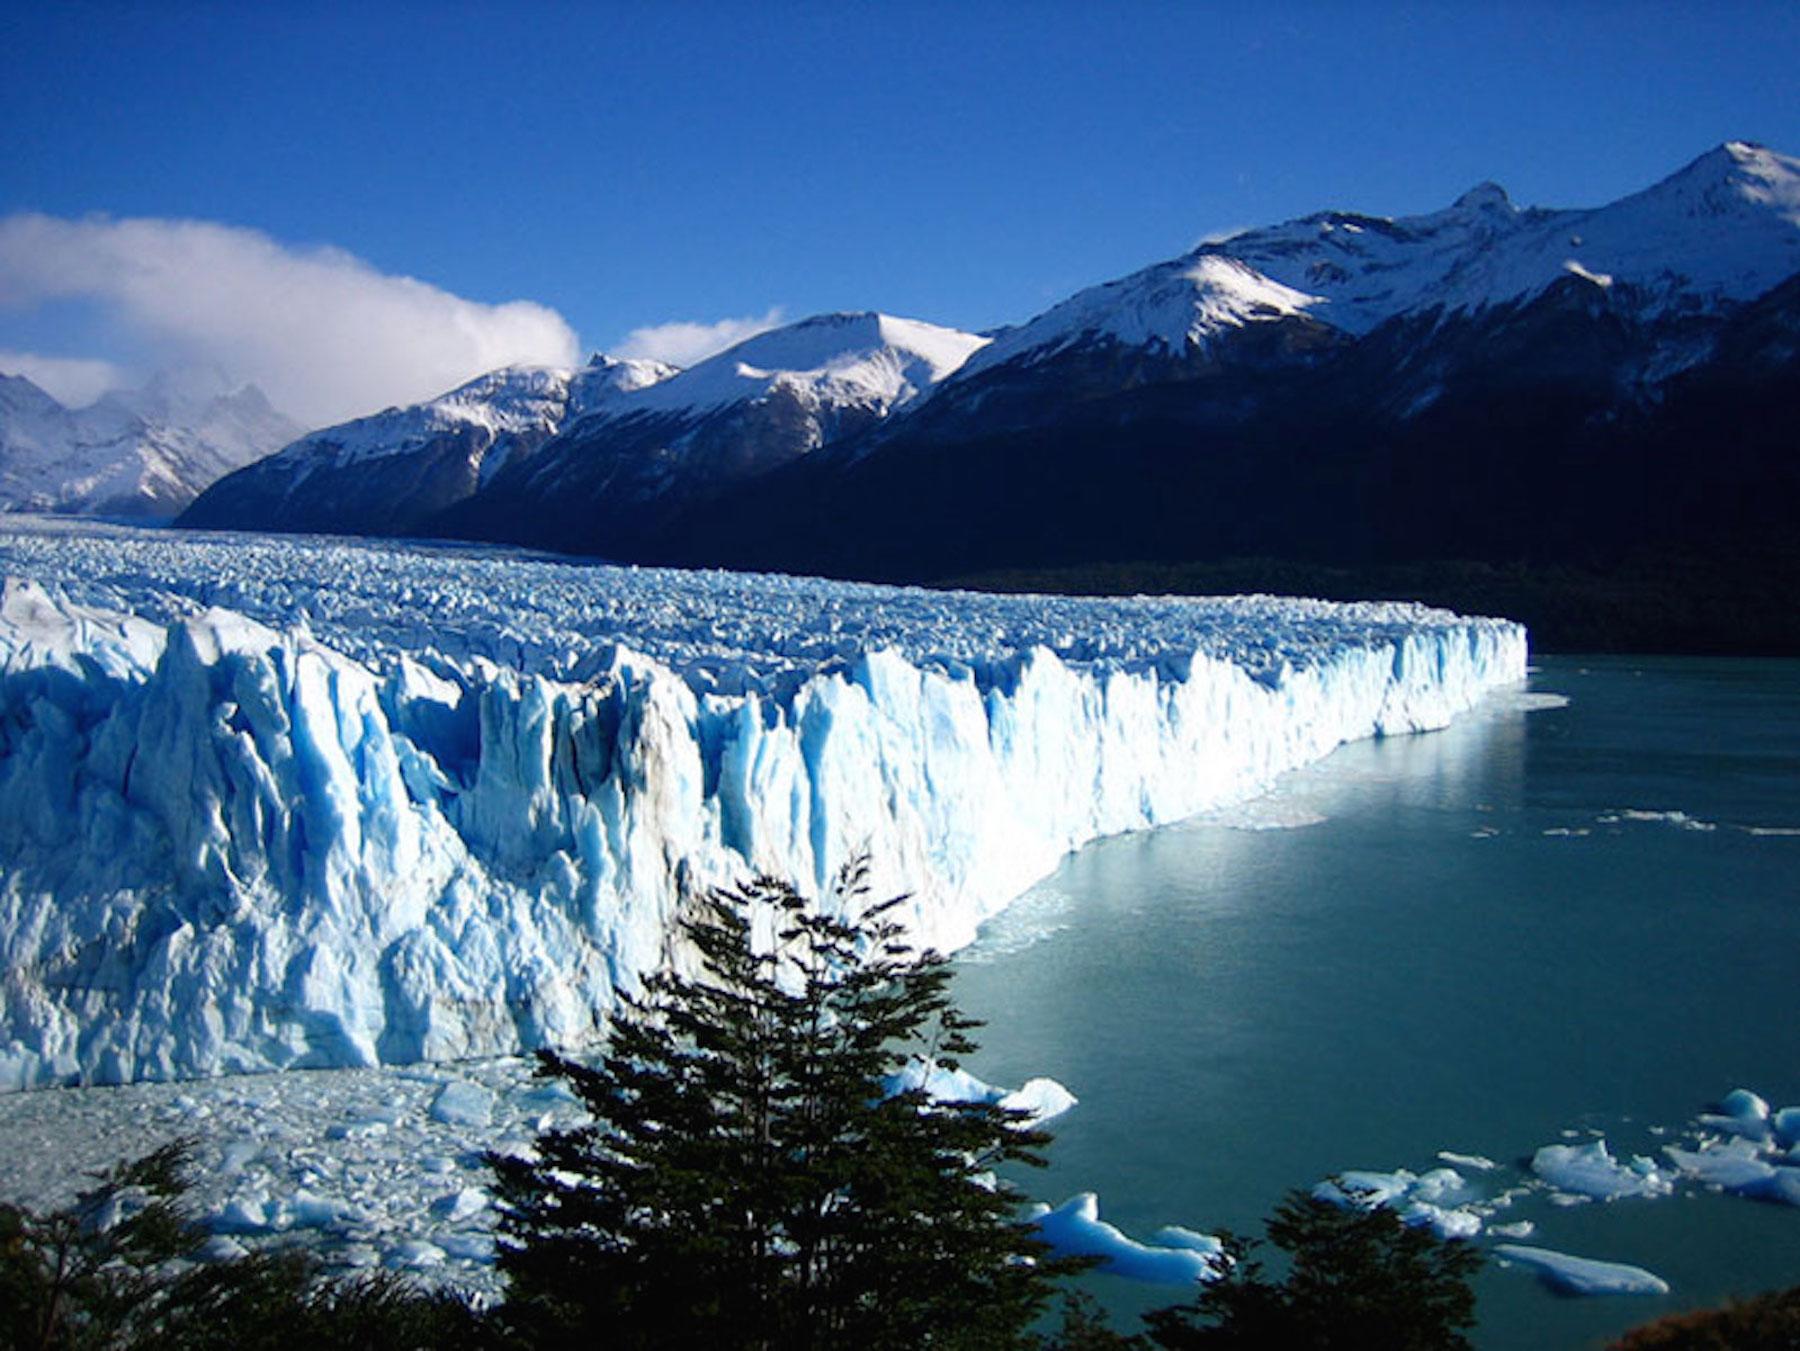 Đất đai vì Bán tại Glaciar Perito Moreno Other Santa Cruz, Santa Cruz, 9405 Argentina